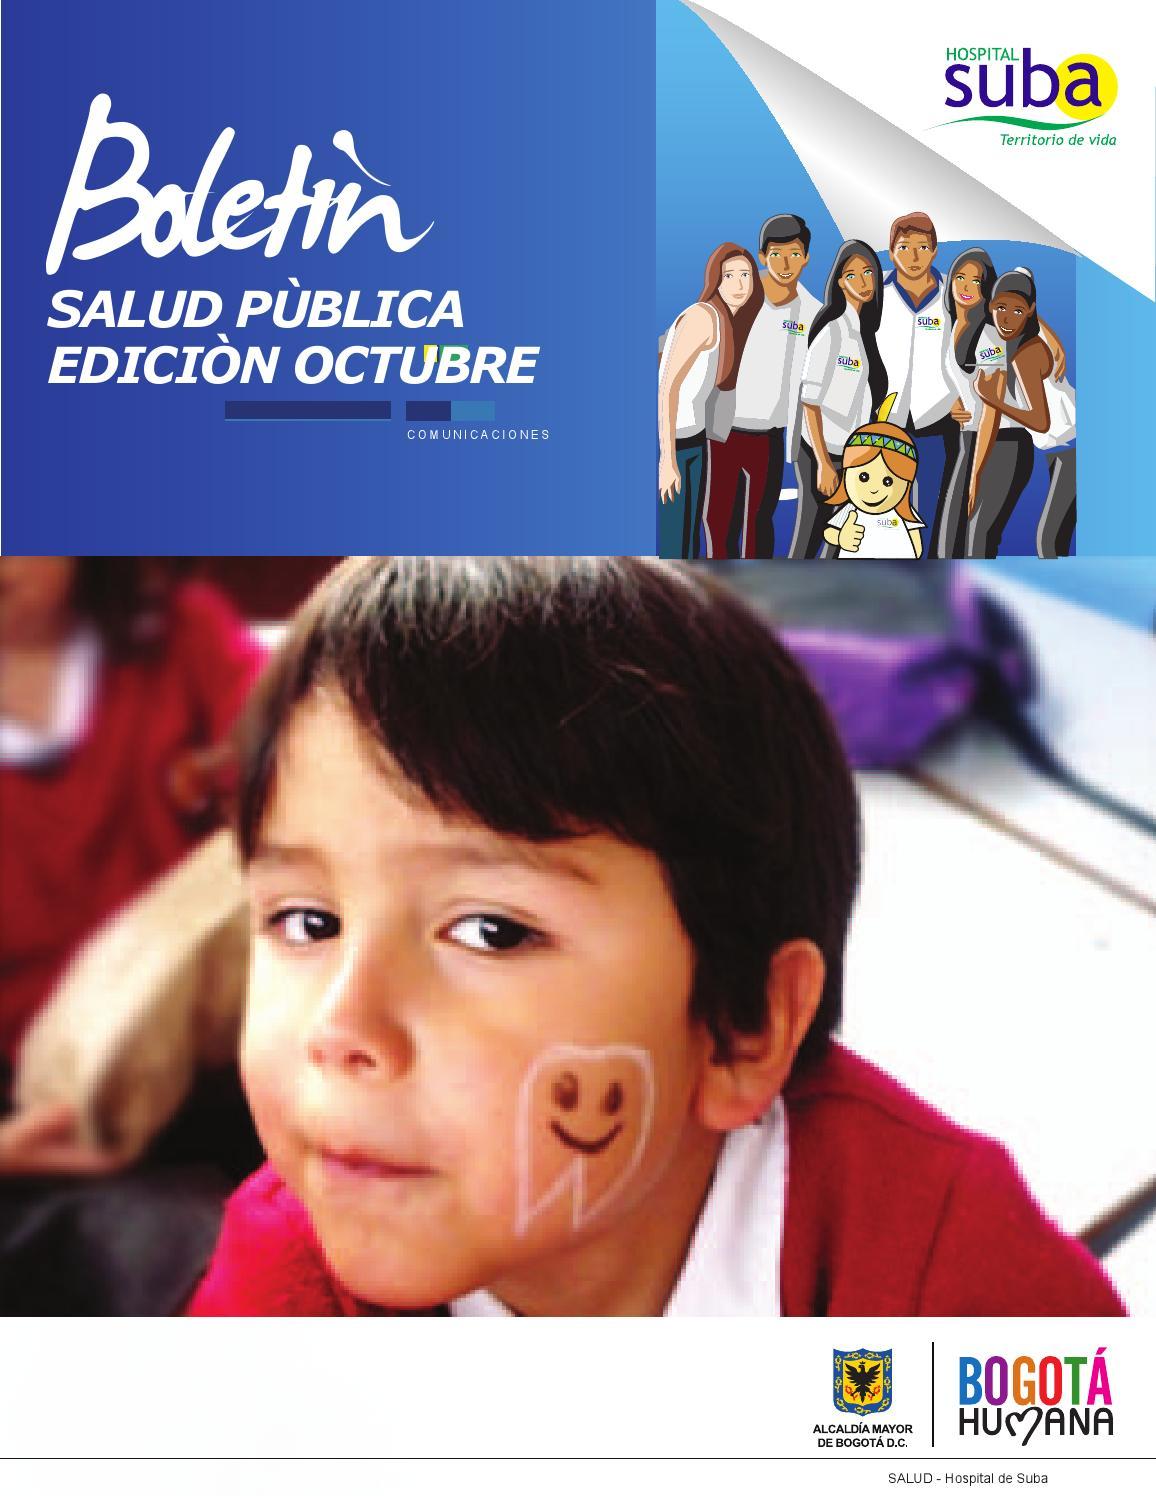 Boletin salud pública edición #5 (2013) by HOSPITAL SUBA - issuu